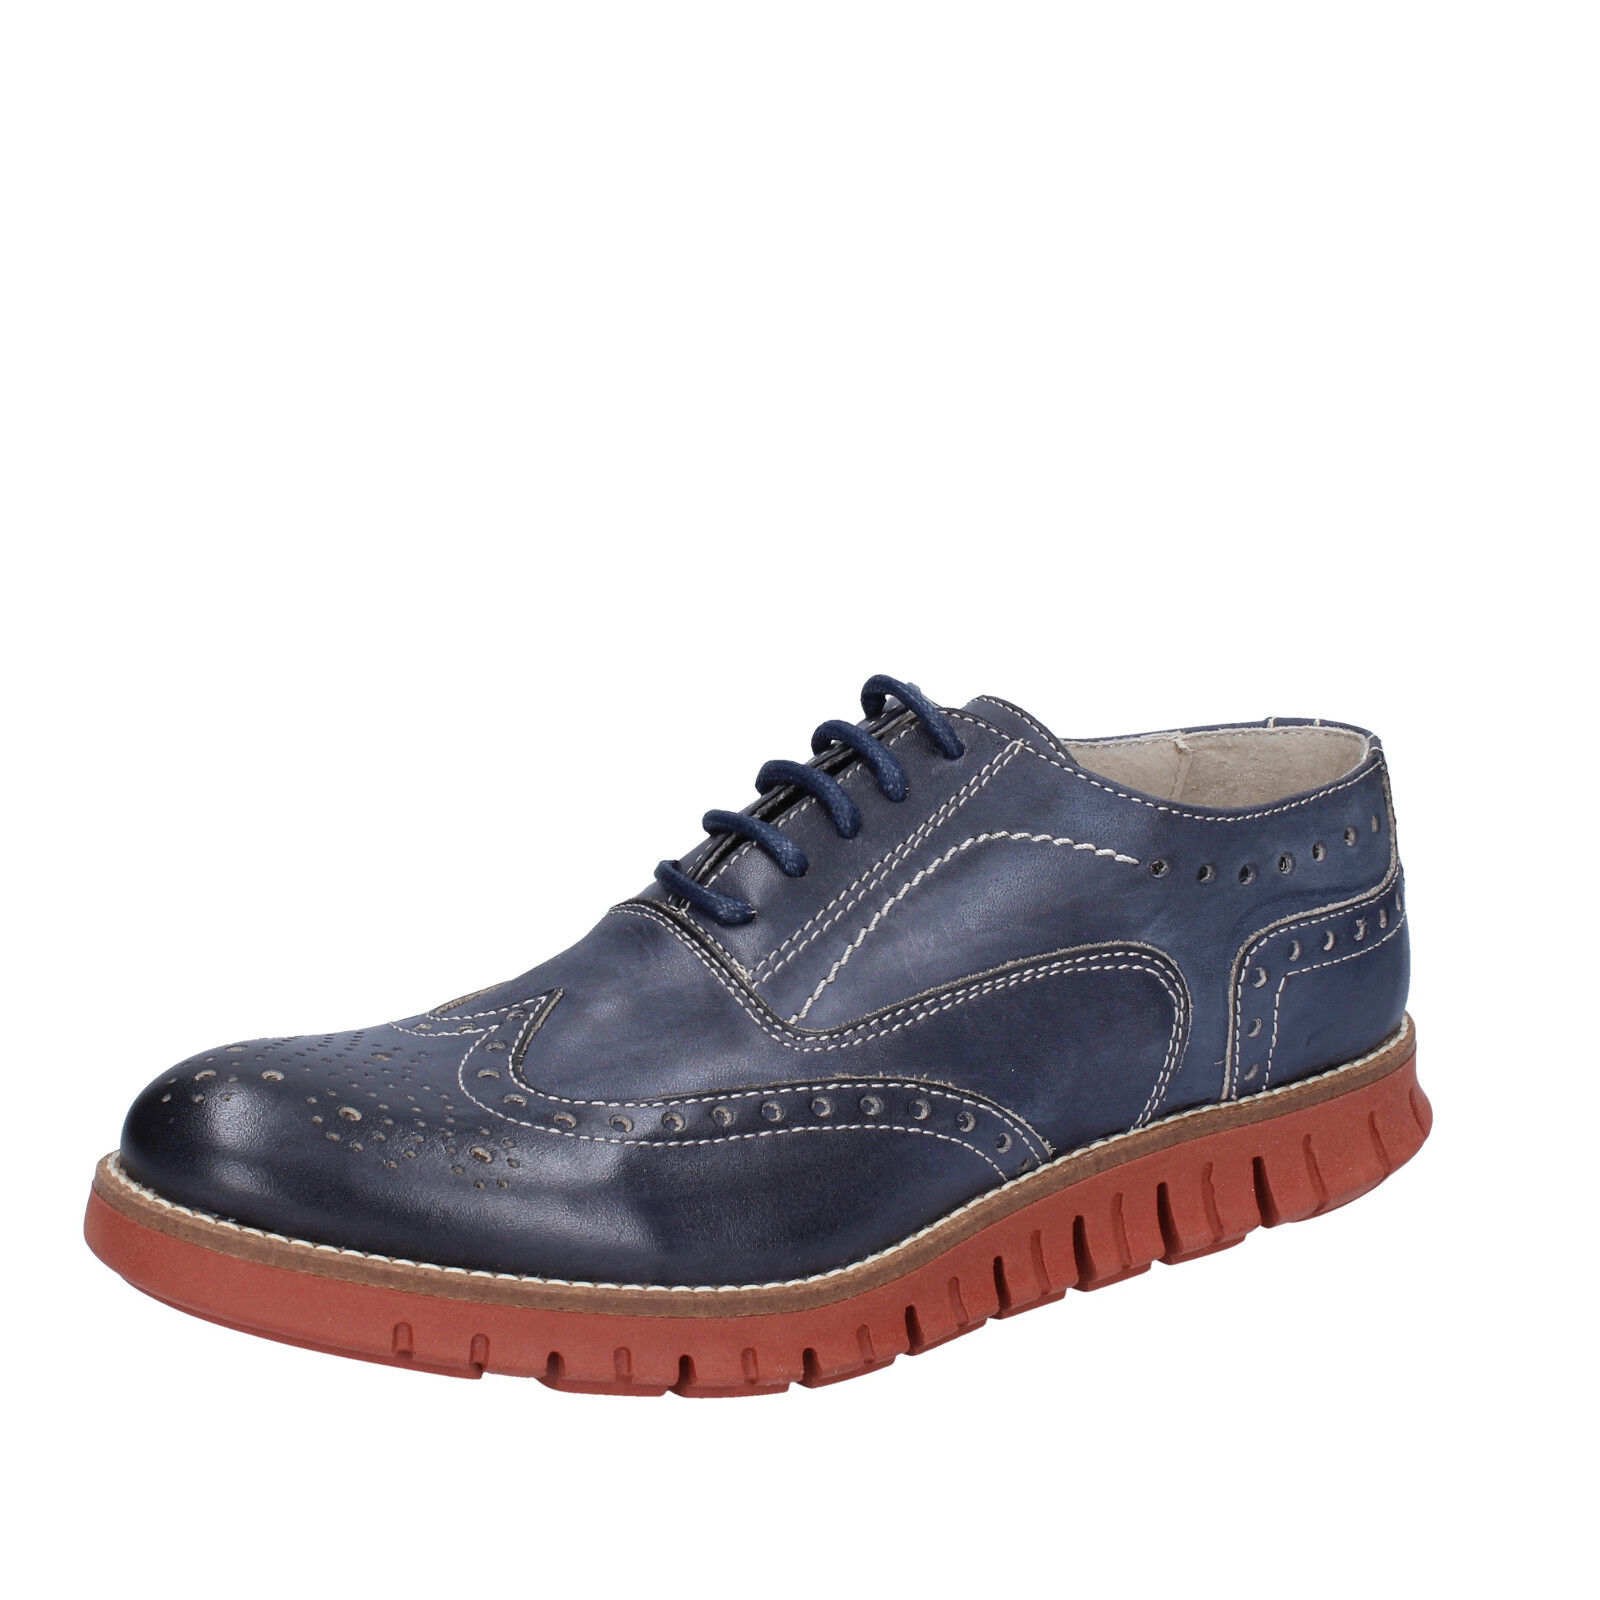 Mens shoes OSSIANI 6 (EU 40) elegant bluee leather BT857-40